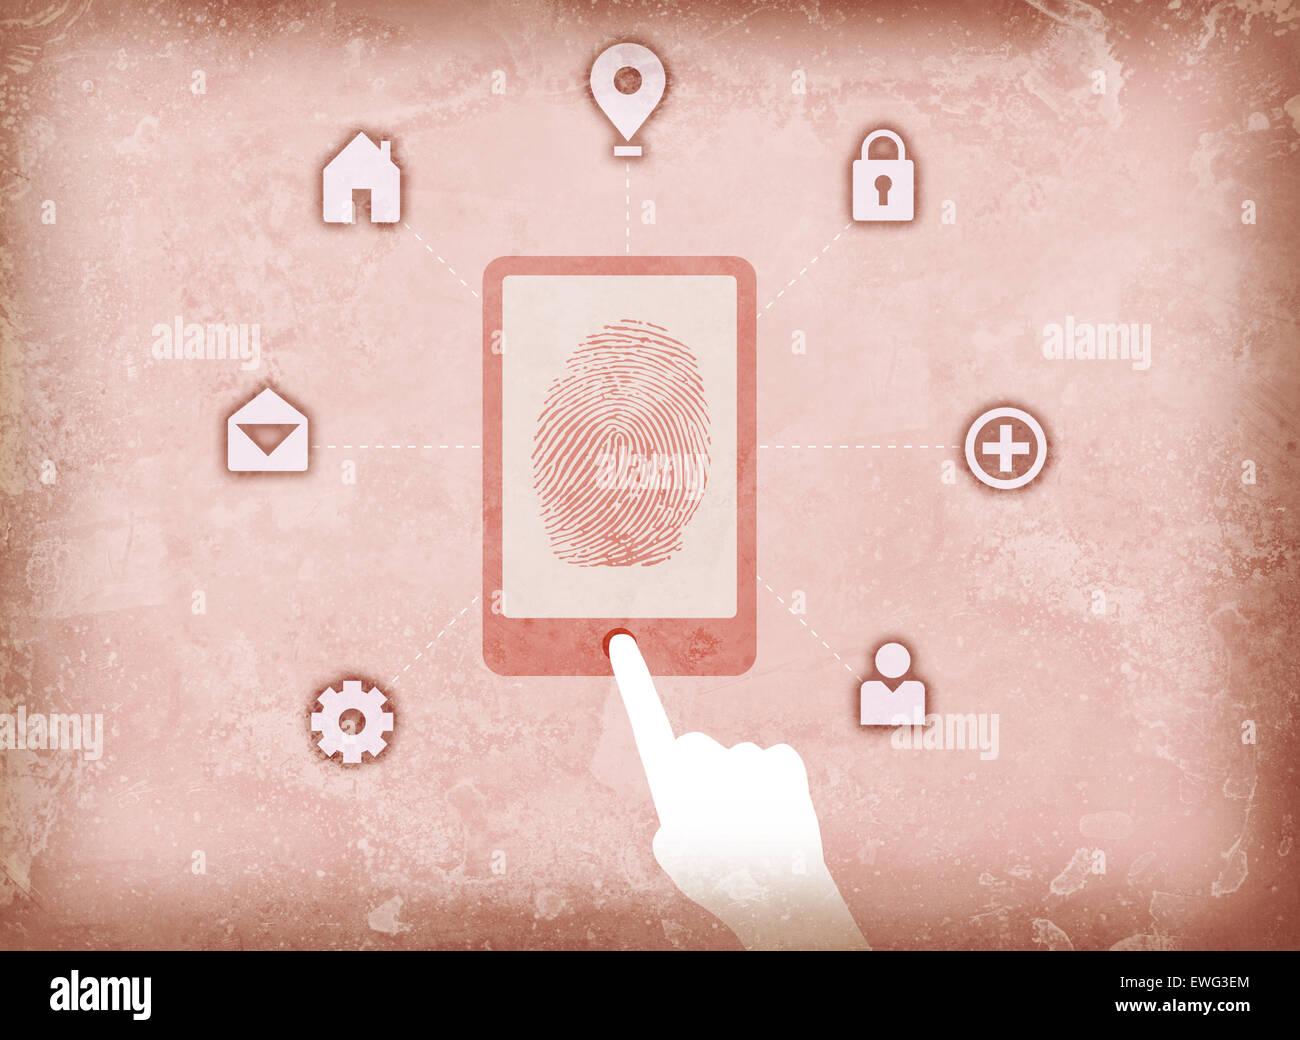 Illustration image of user accessing fingerprint scanner - Stock Image